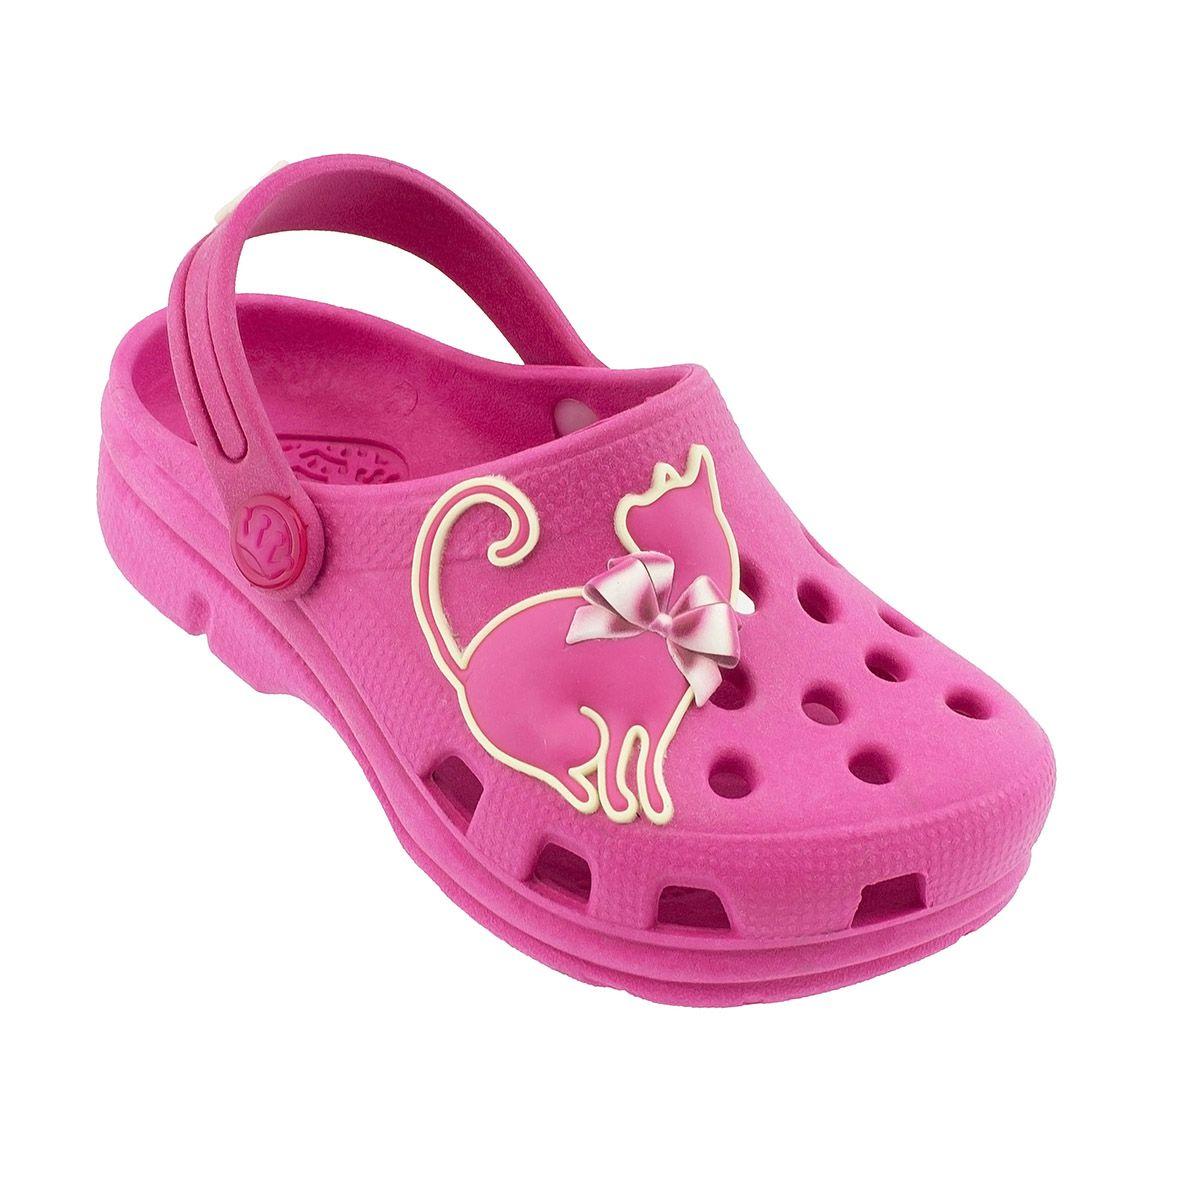 Babuche Plugt Gatinha Brilha no Escuro Pink